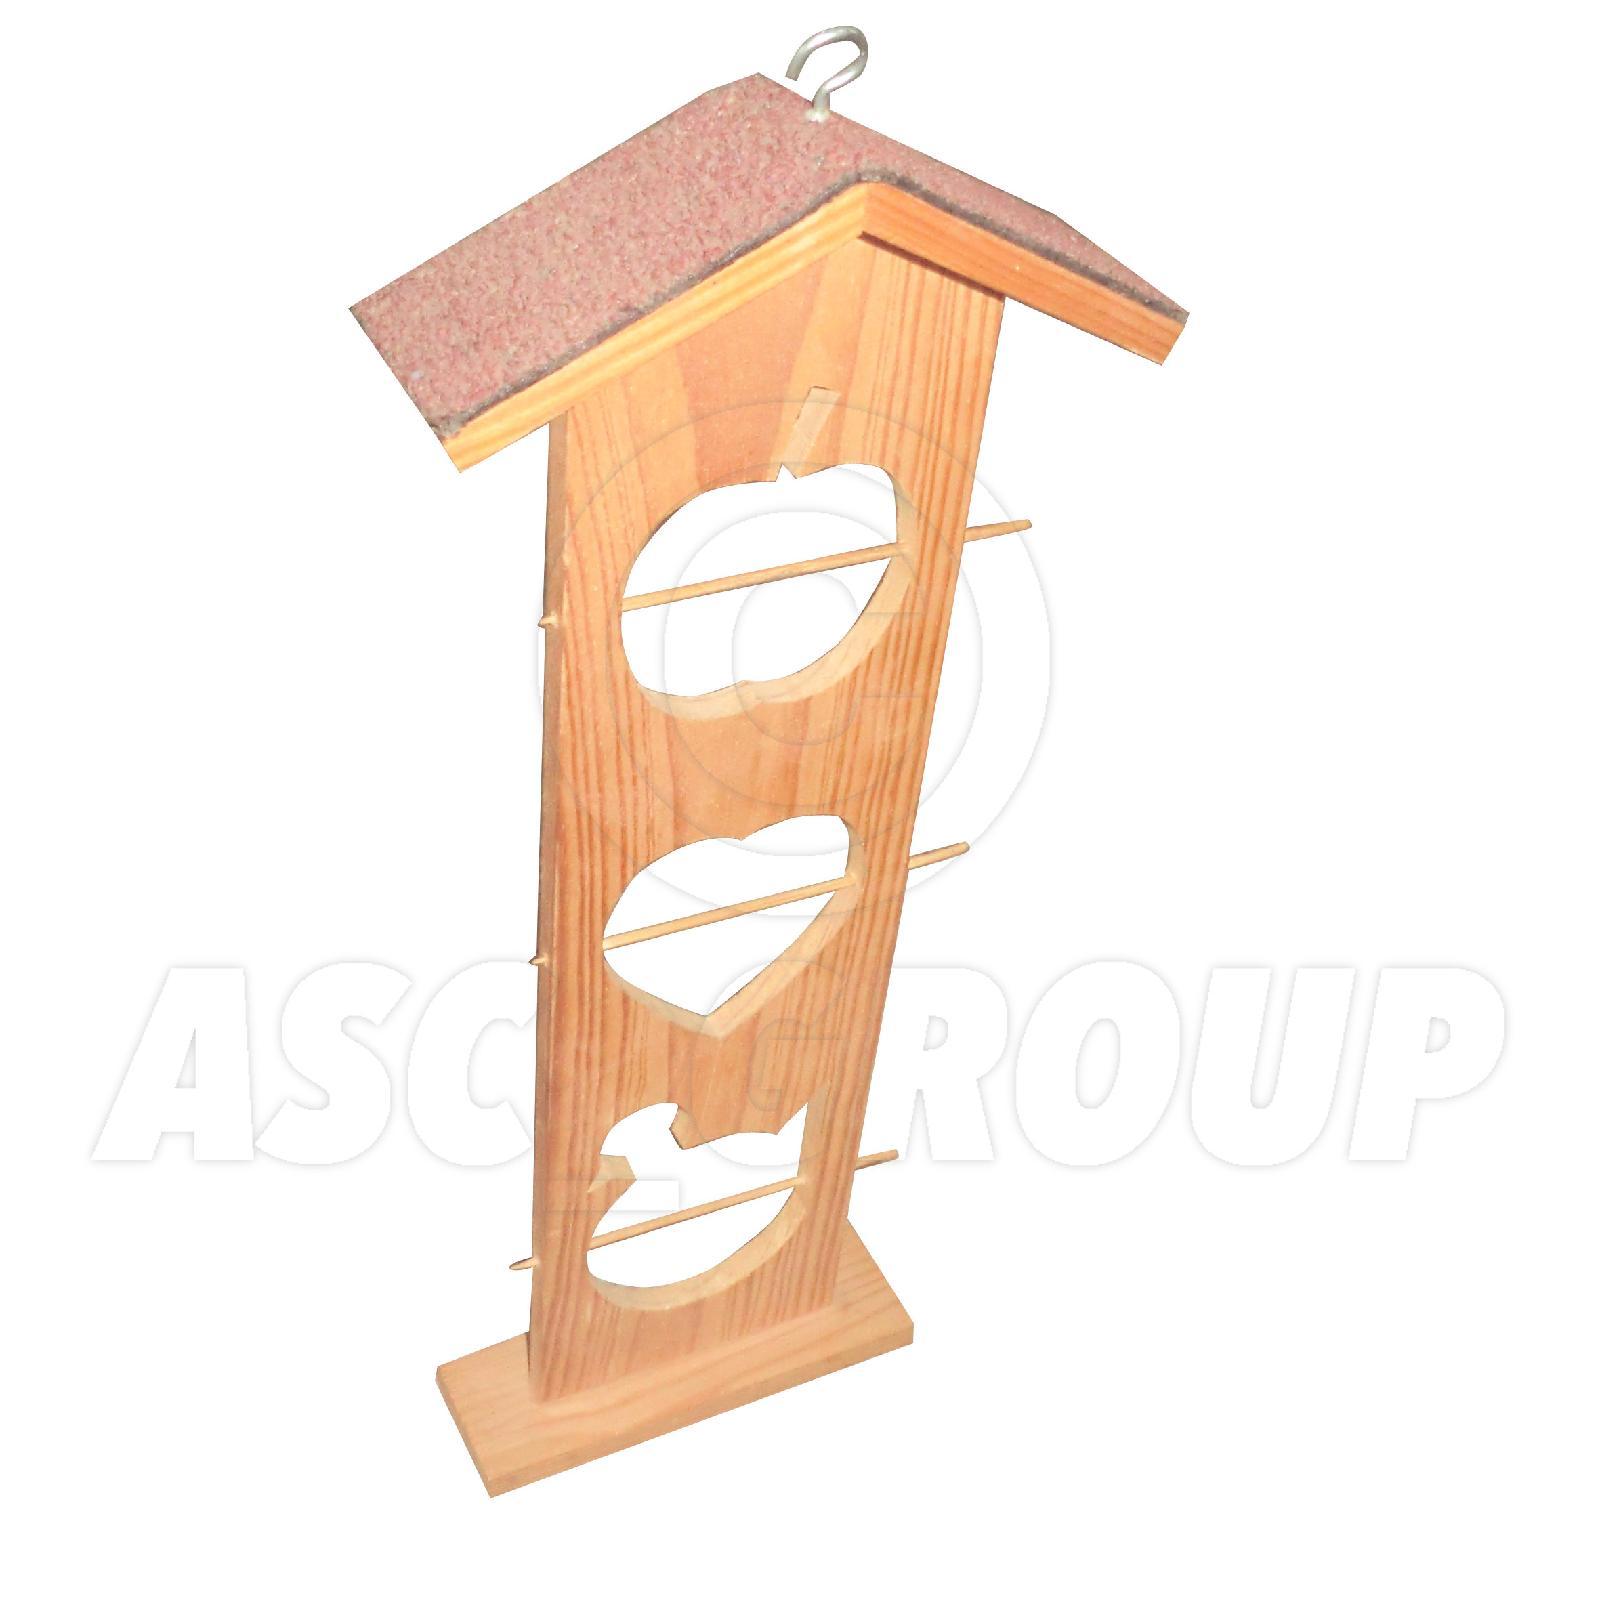 Details about 3 tier wooden bird feeder apple house